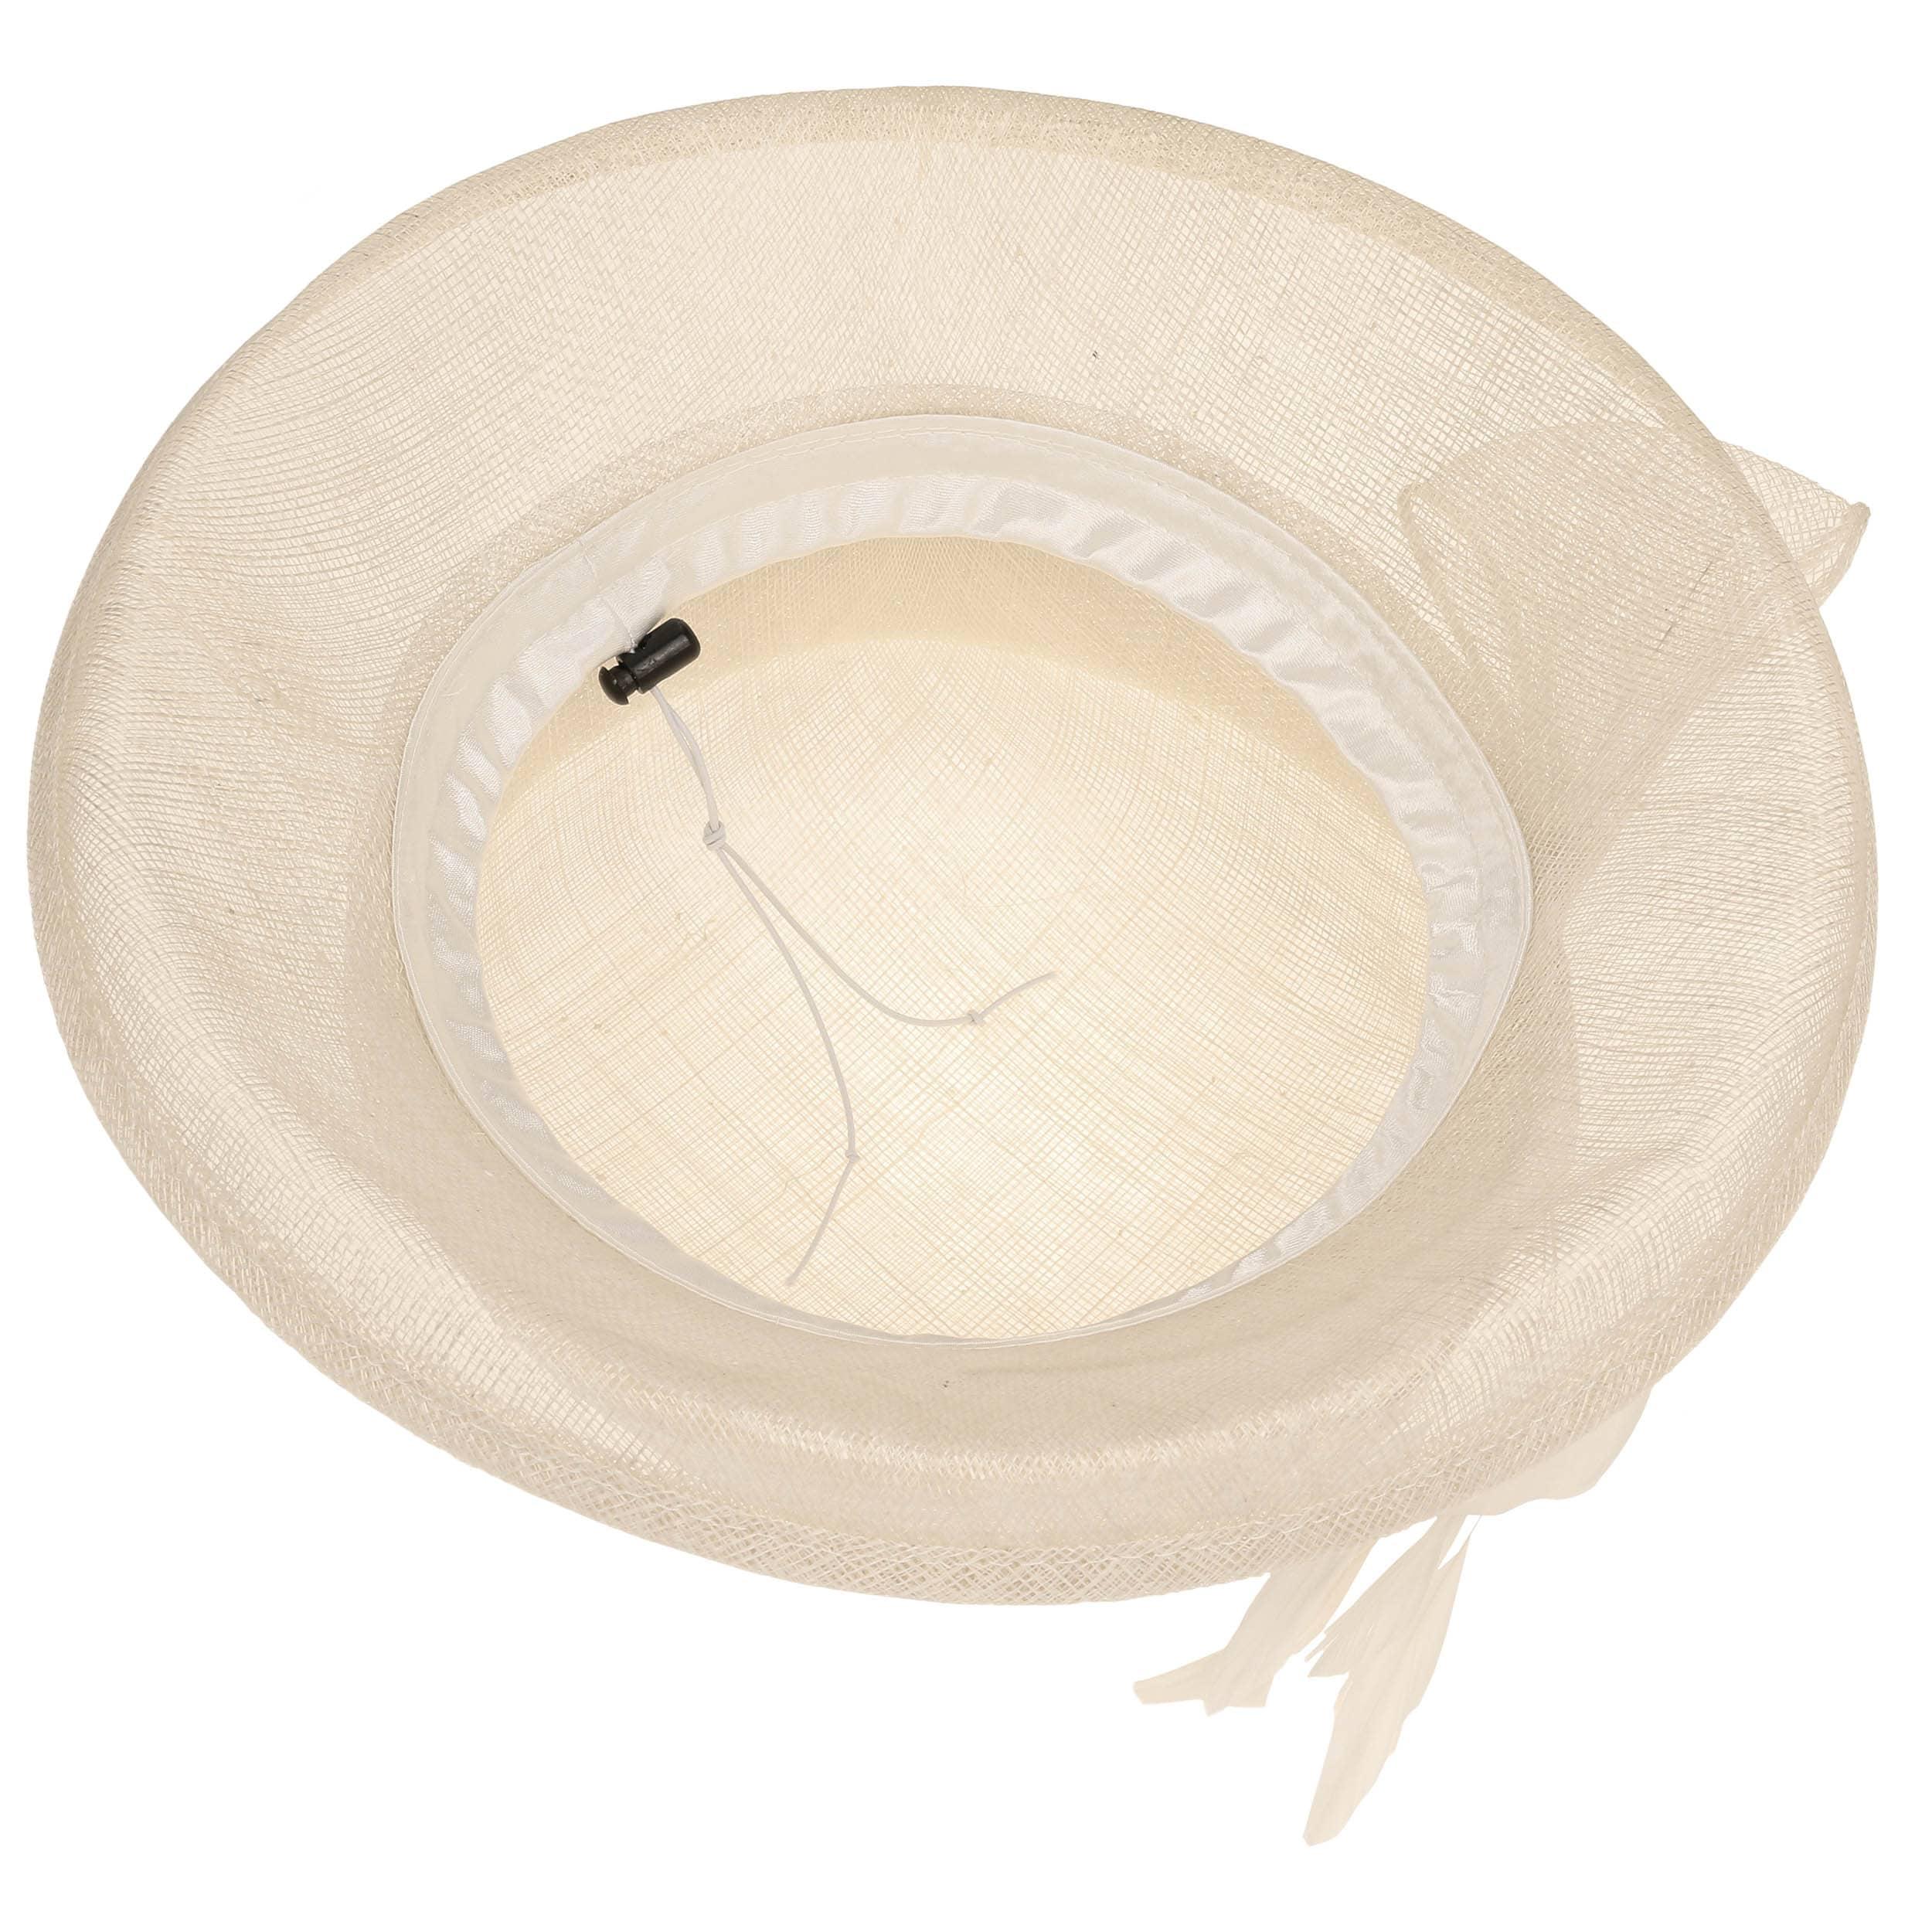 Lorene Occasion Hat By Lierys, EUR 109,00 --> Hats, Caps